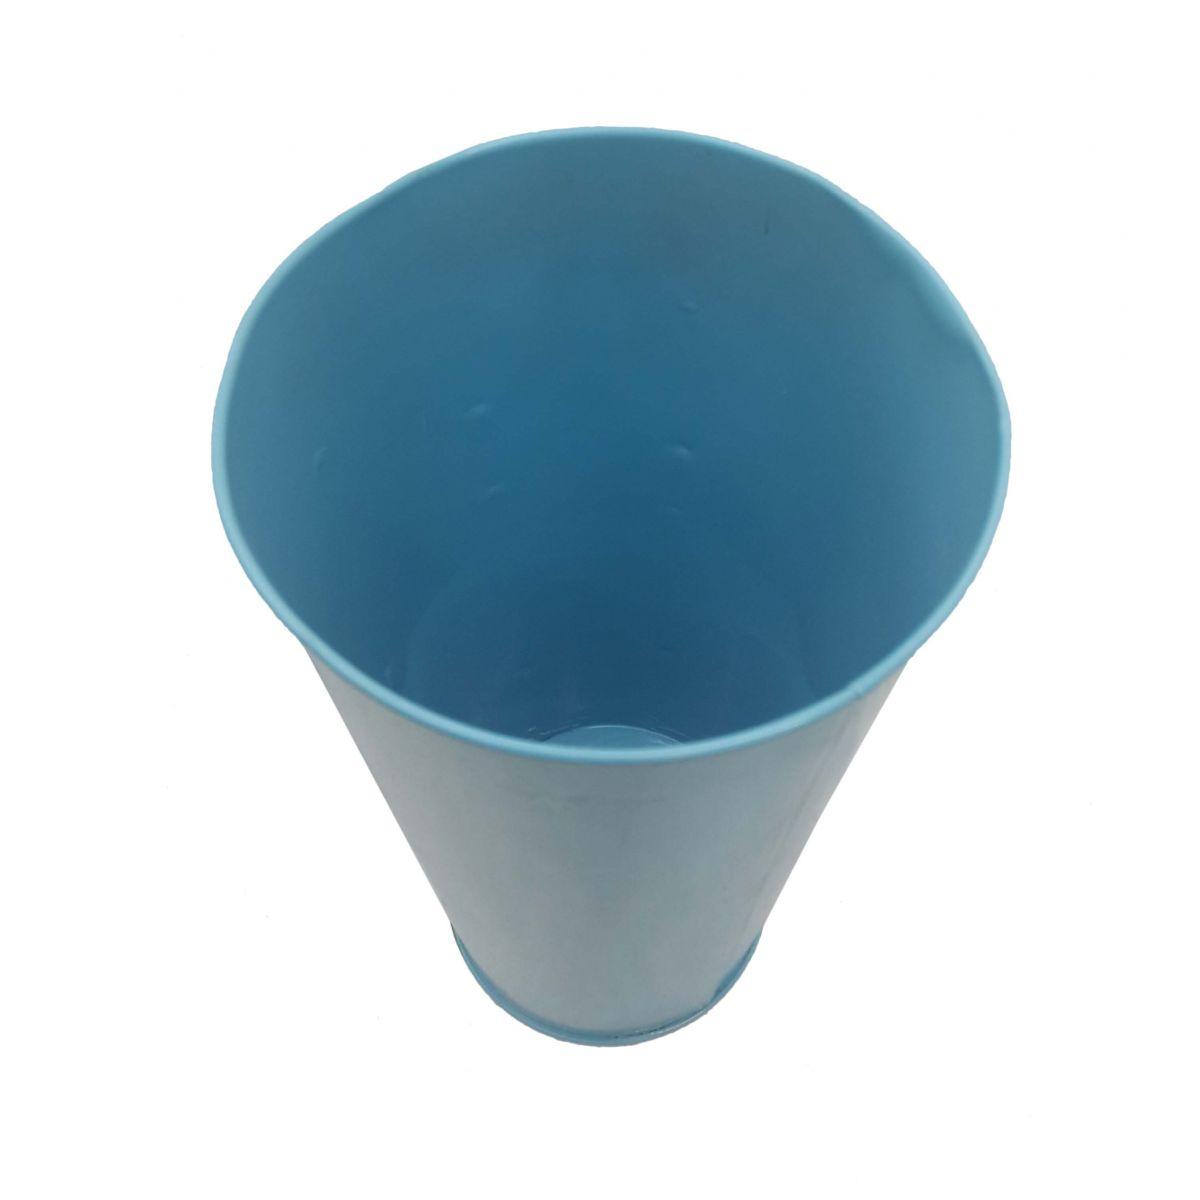 Vaso Metal Enfeite Jardim Quintal Varanda Borboleta Flor Azul (SYBO-G7)